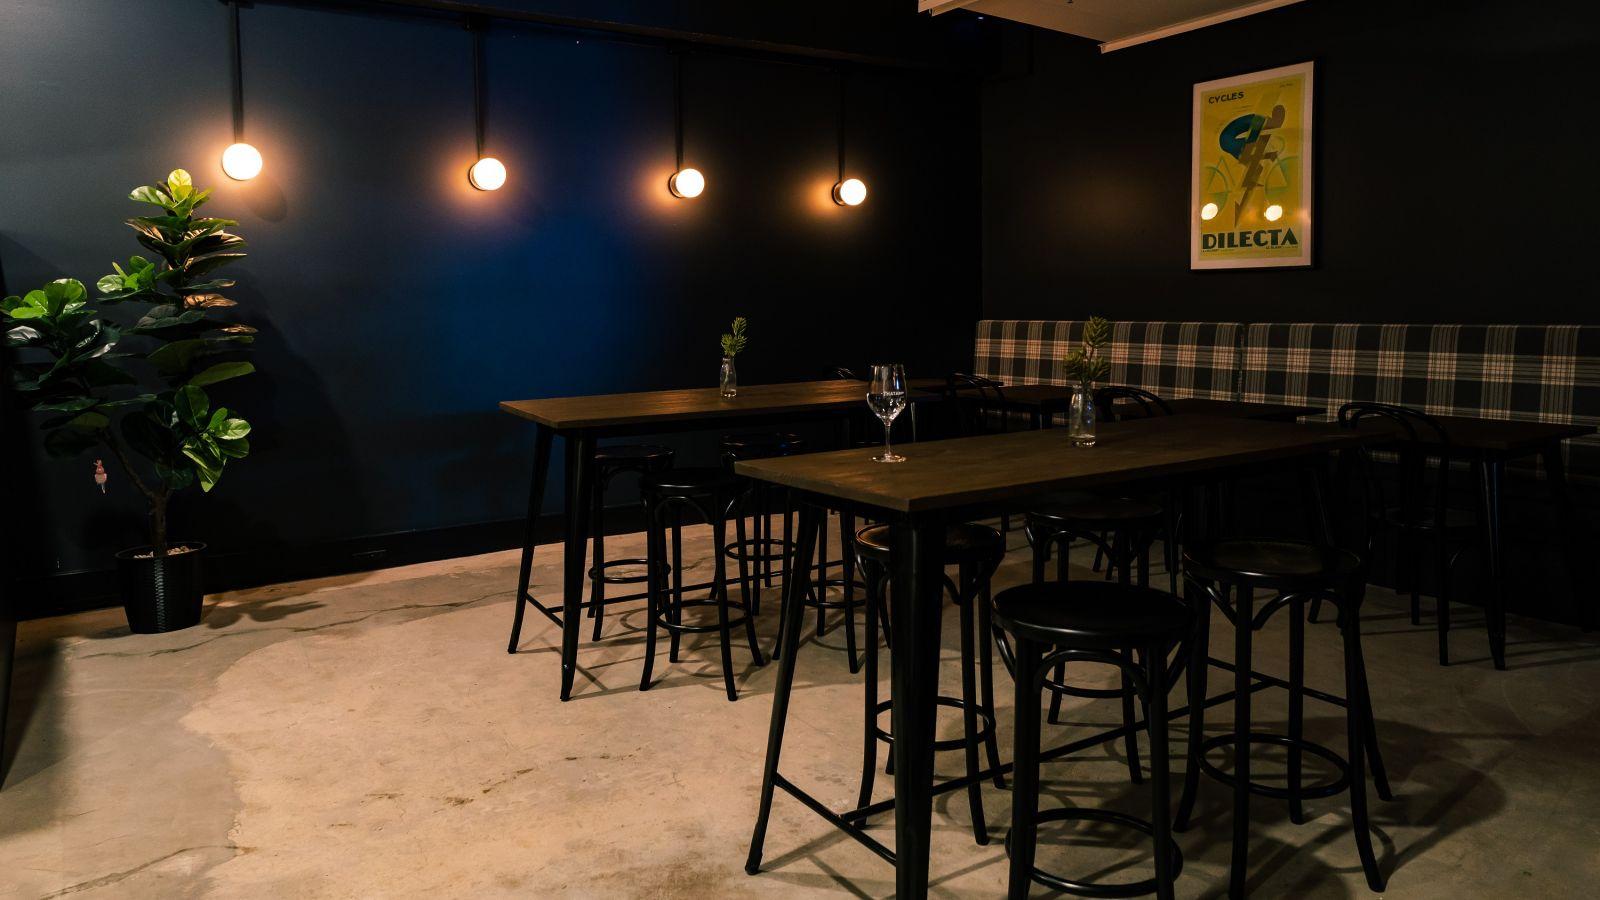 Thataboy Wine Bar Bar Fitout 3